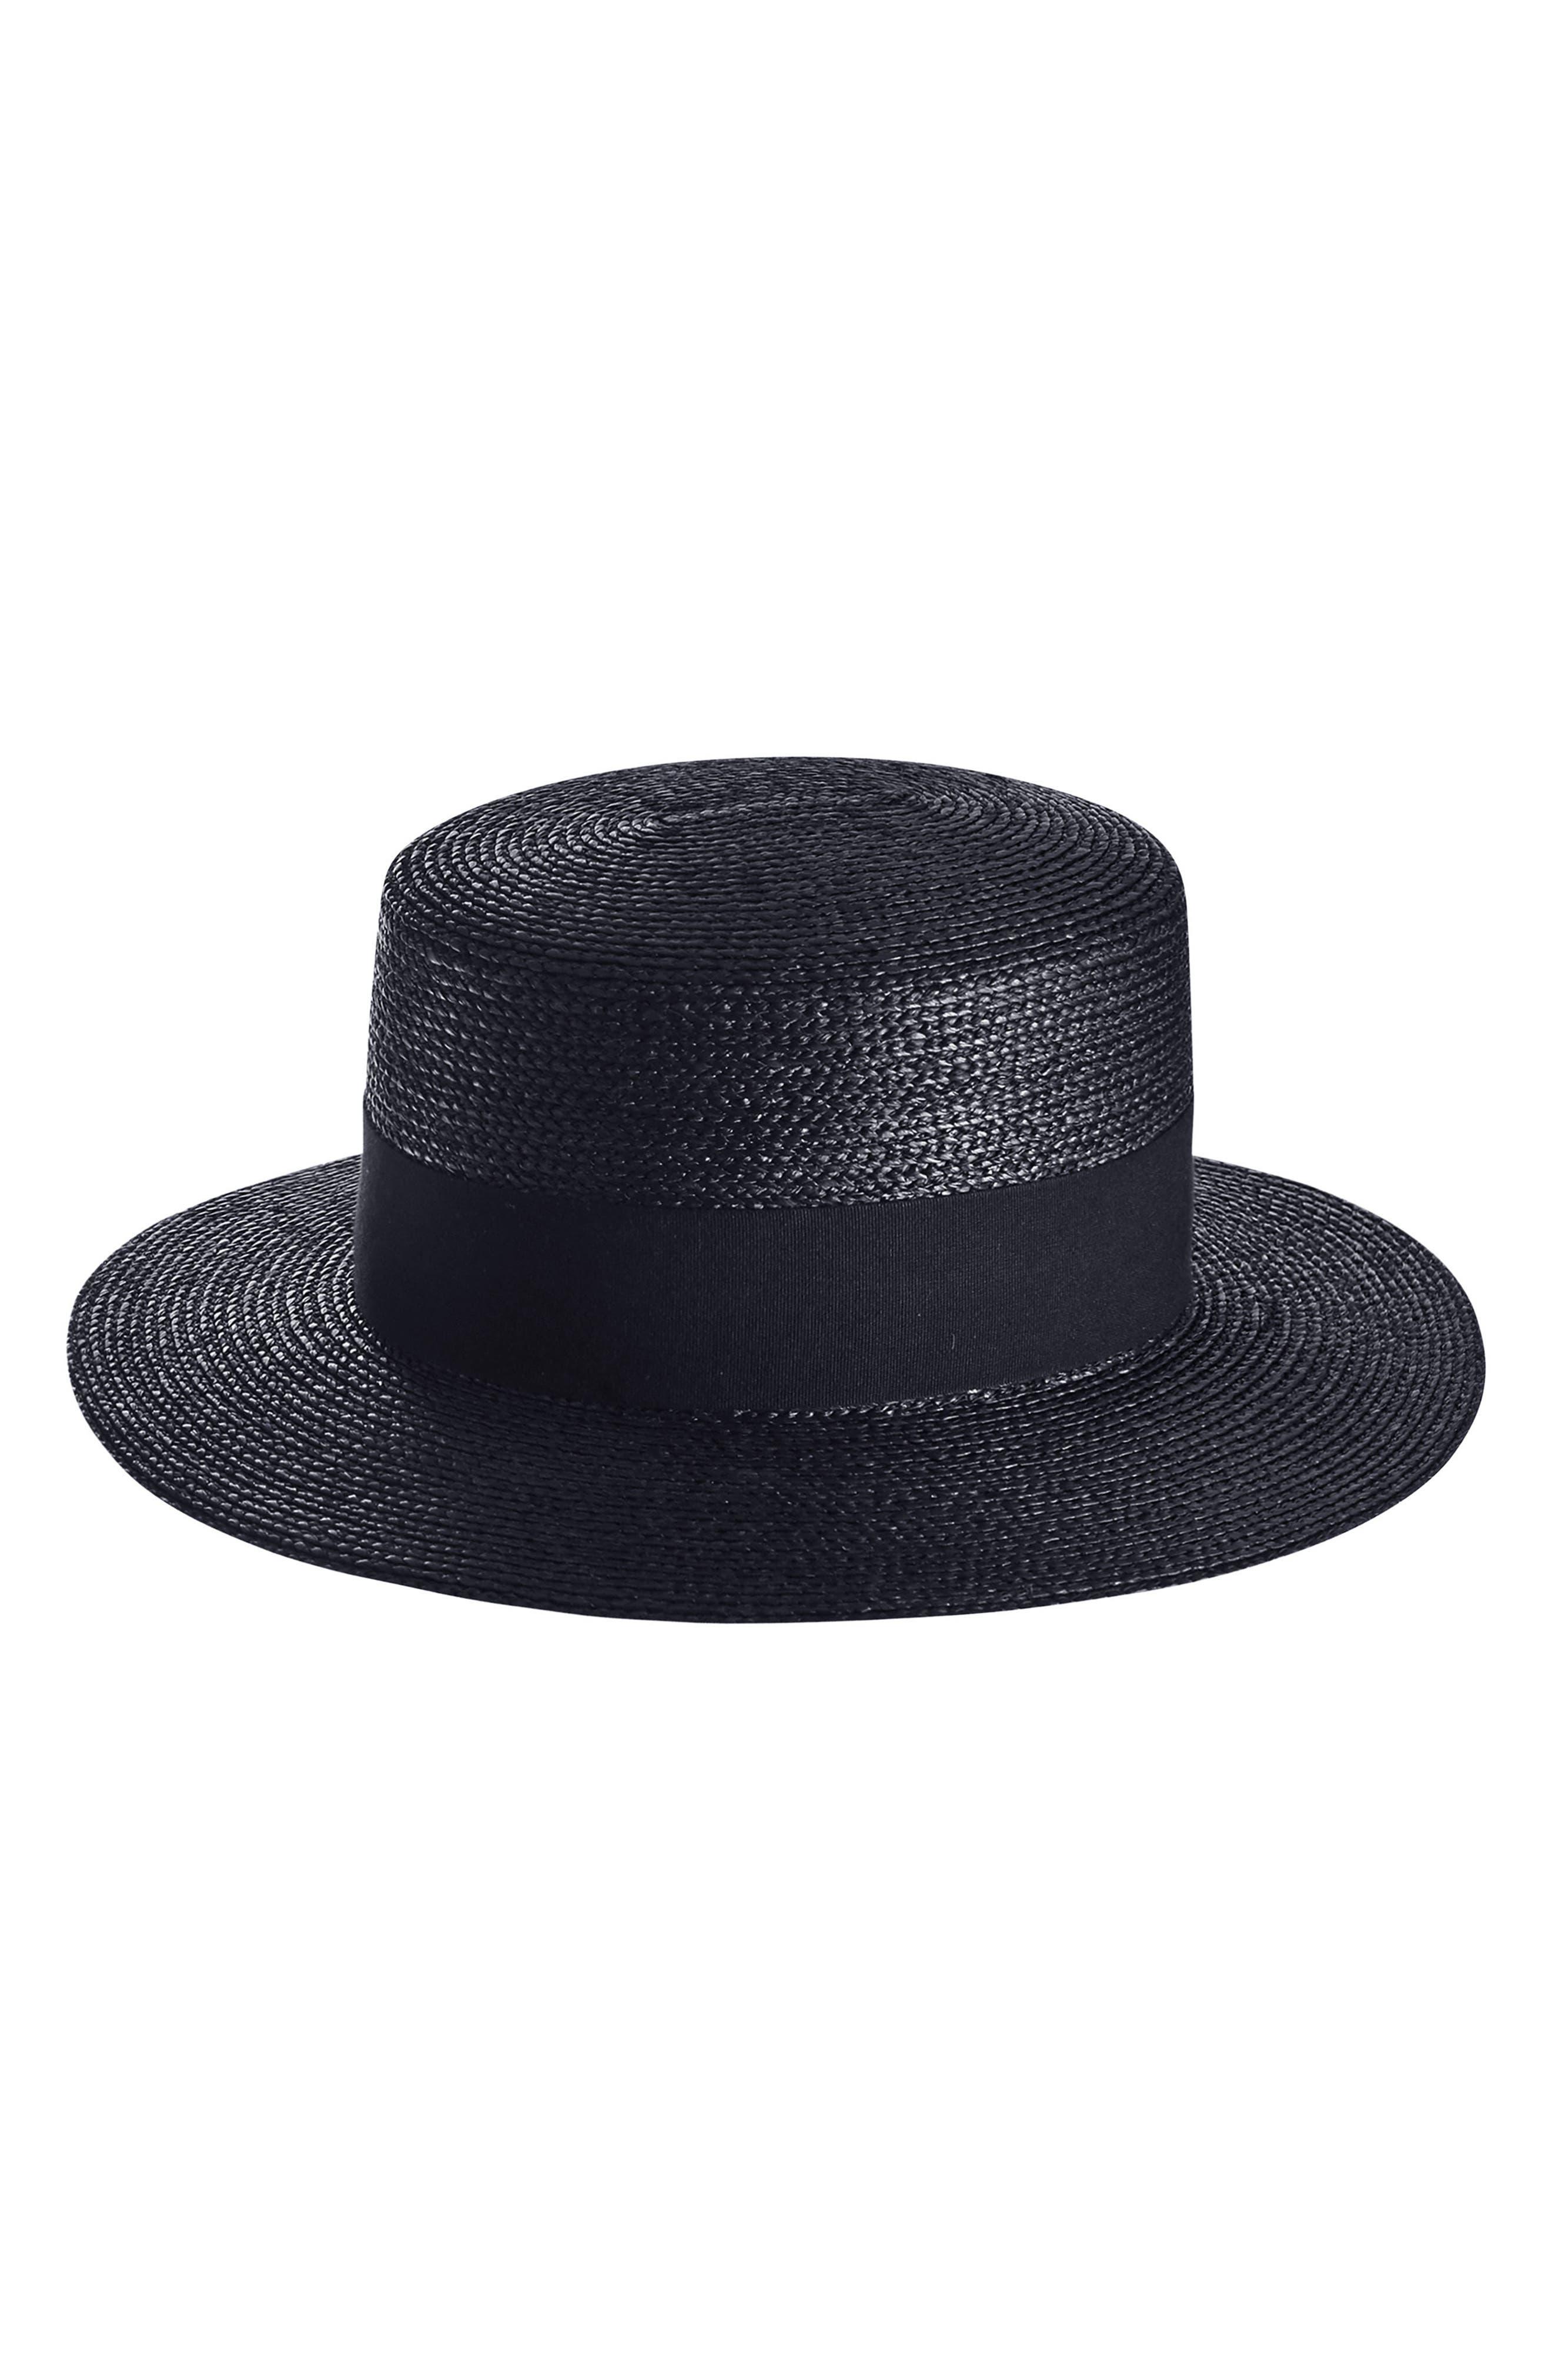 Braided Raffia Boater Hat,                             Alternate thumbnail 2, color,                             003